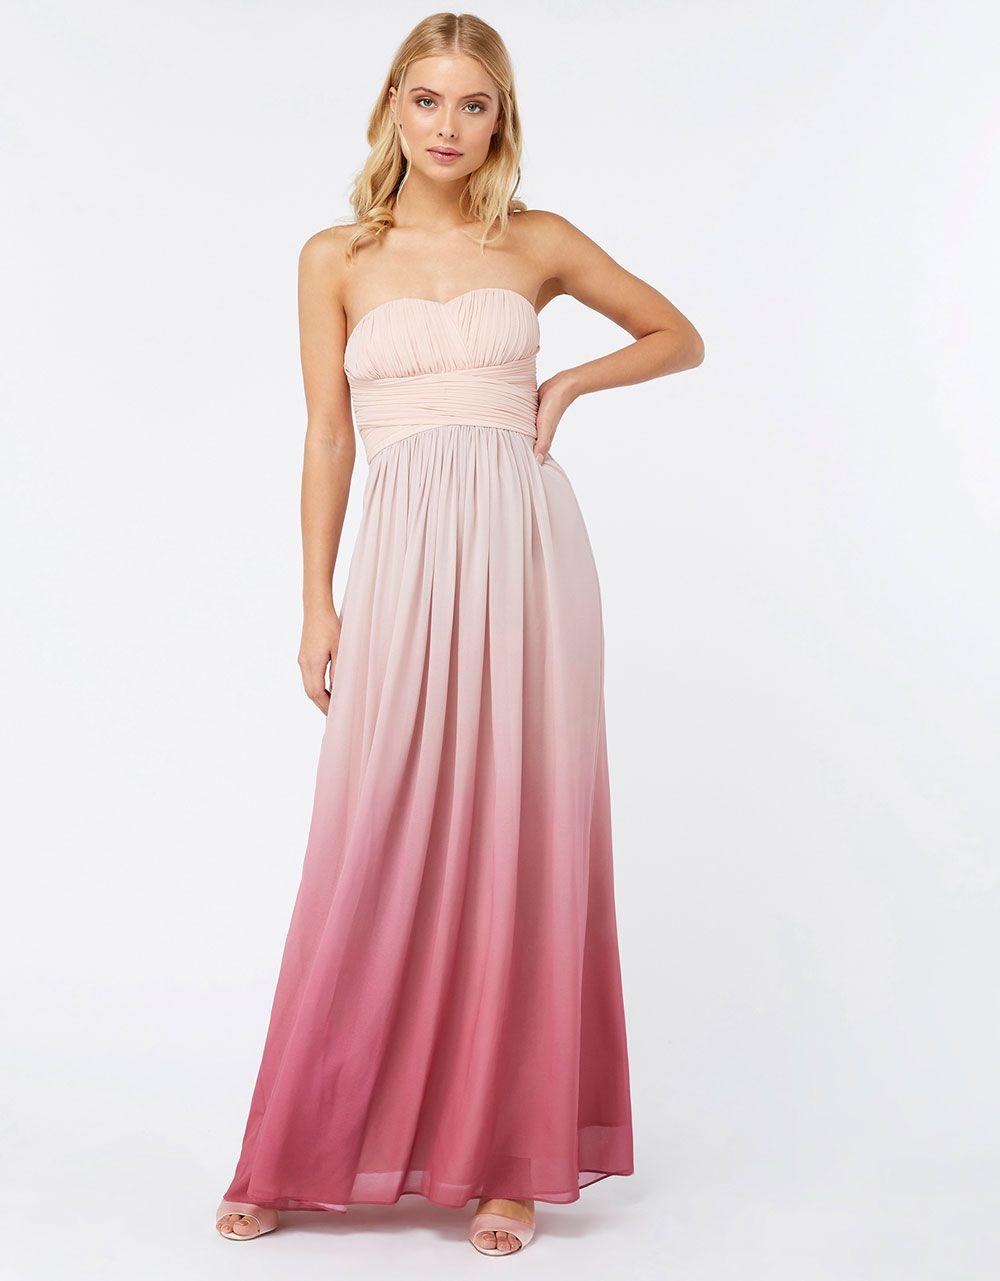 Plus size bridesmaid dresses - Monsoon